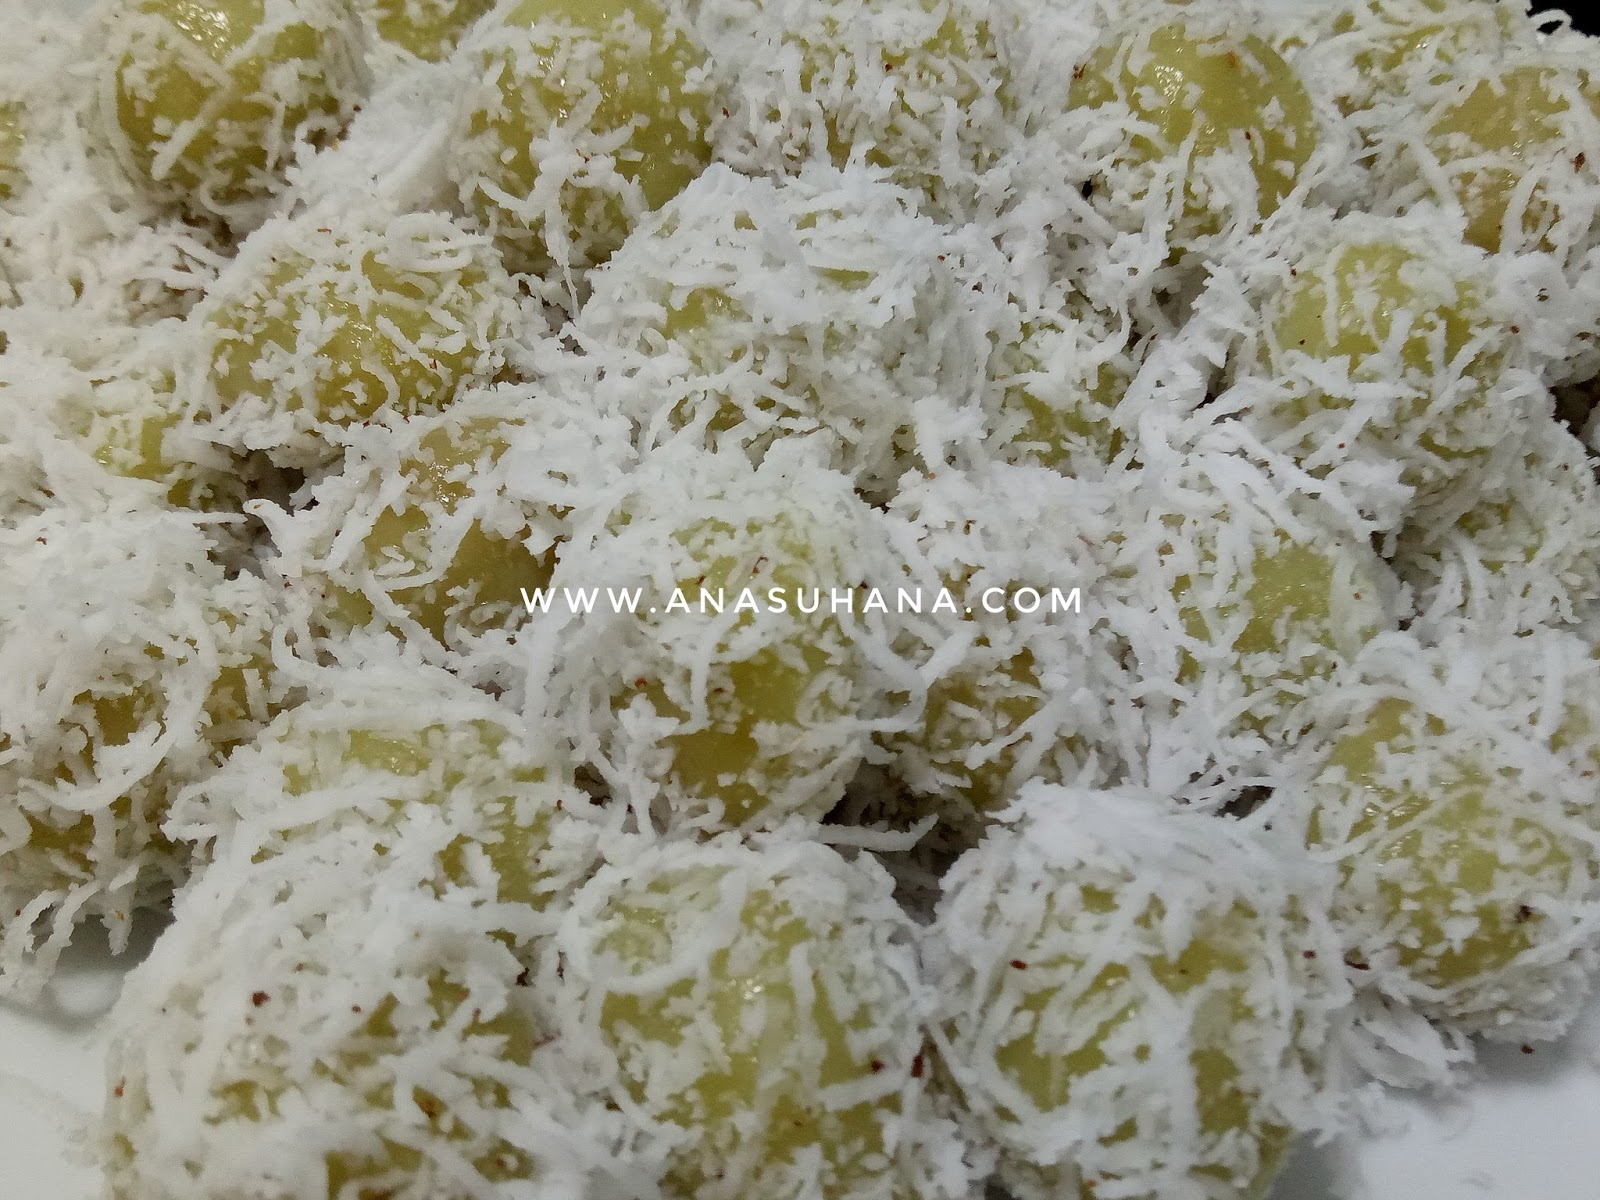 Resepi Onde-onde Gula Melaka Tanpa Pewarna Makanan Mudah dan Sedap